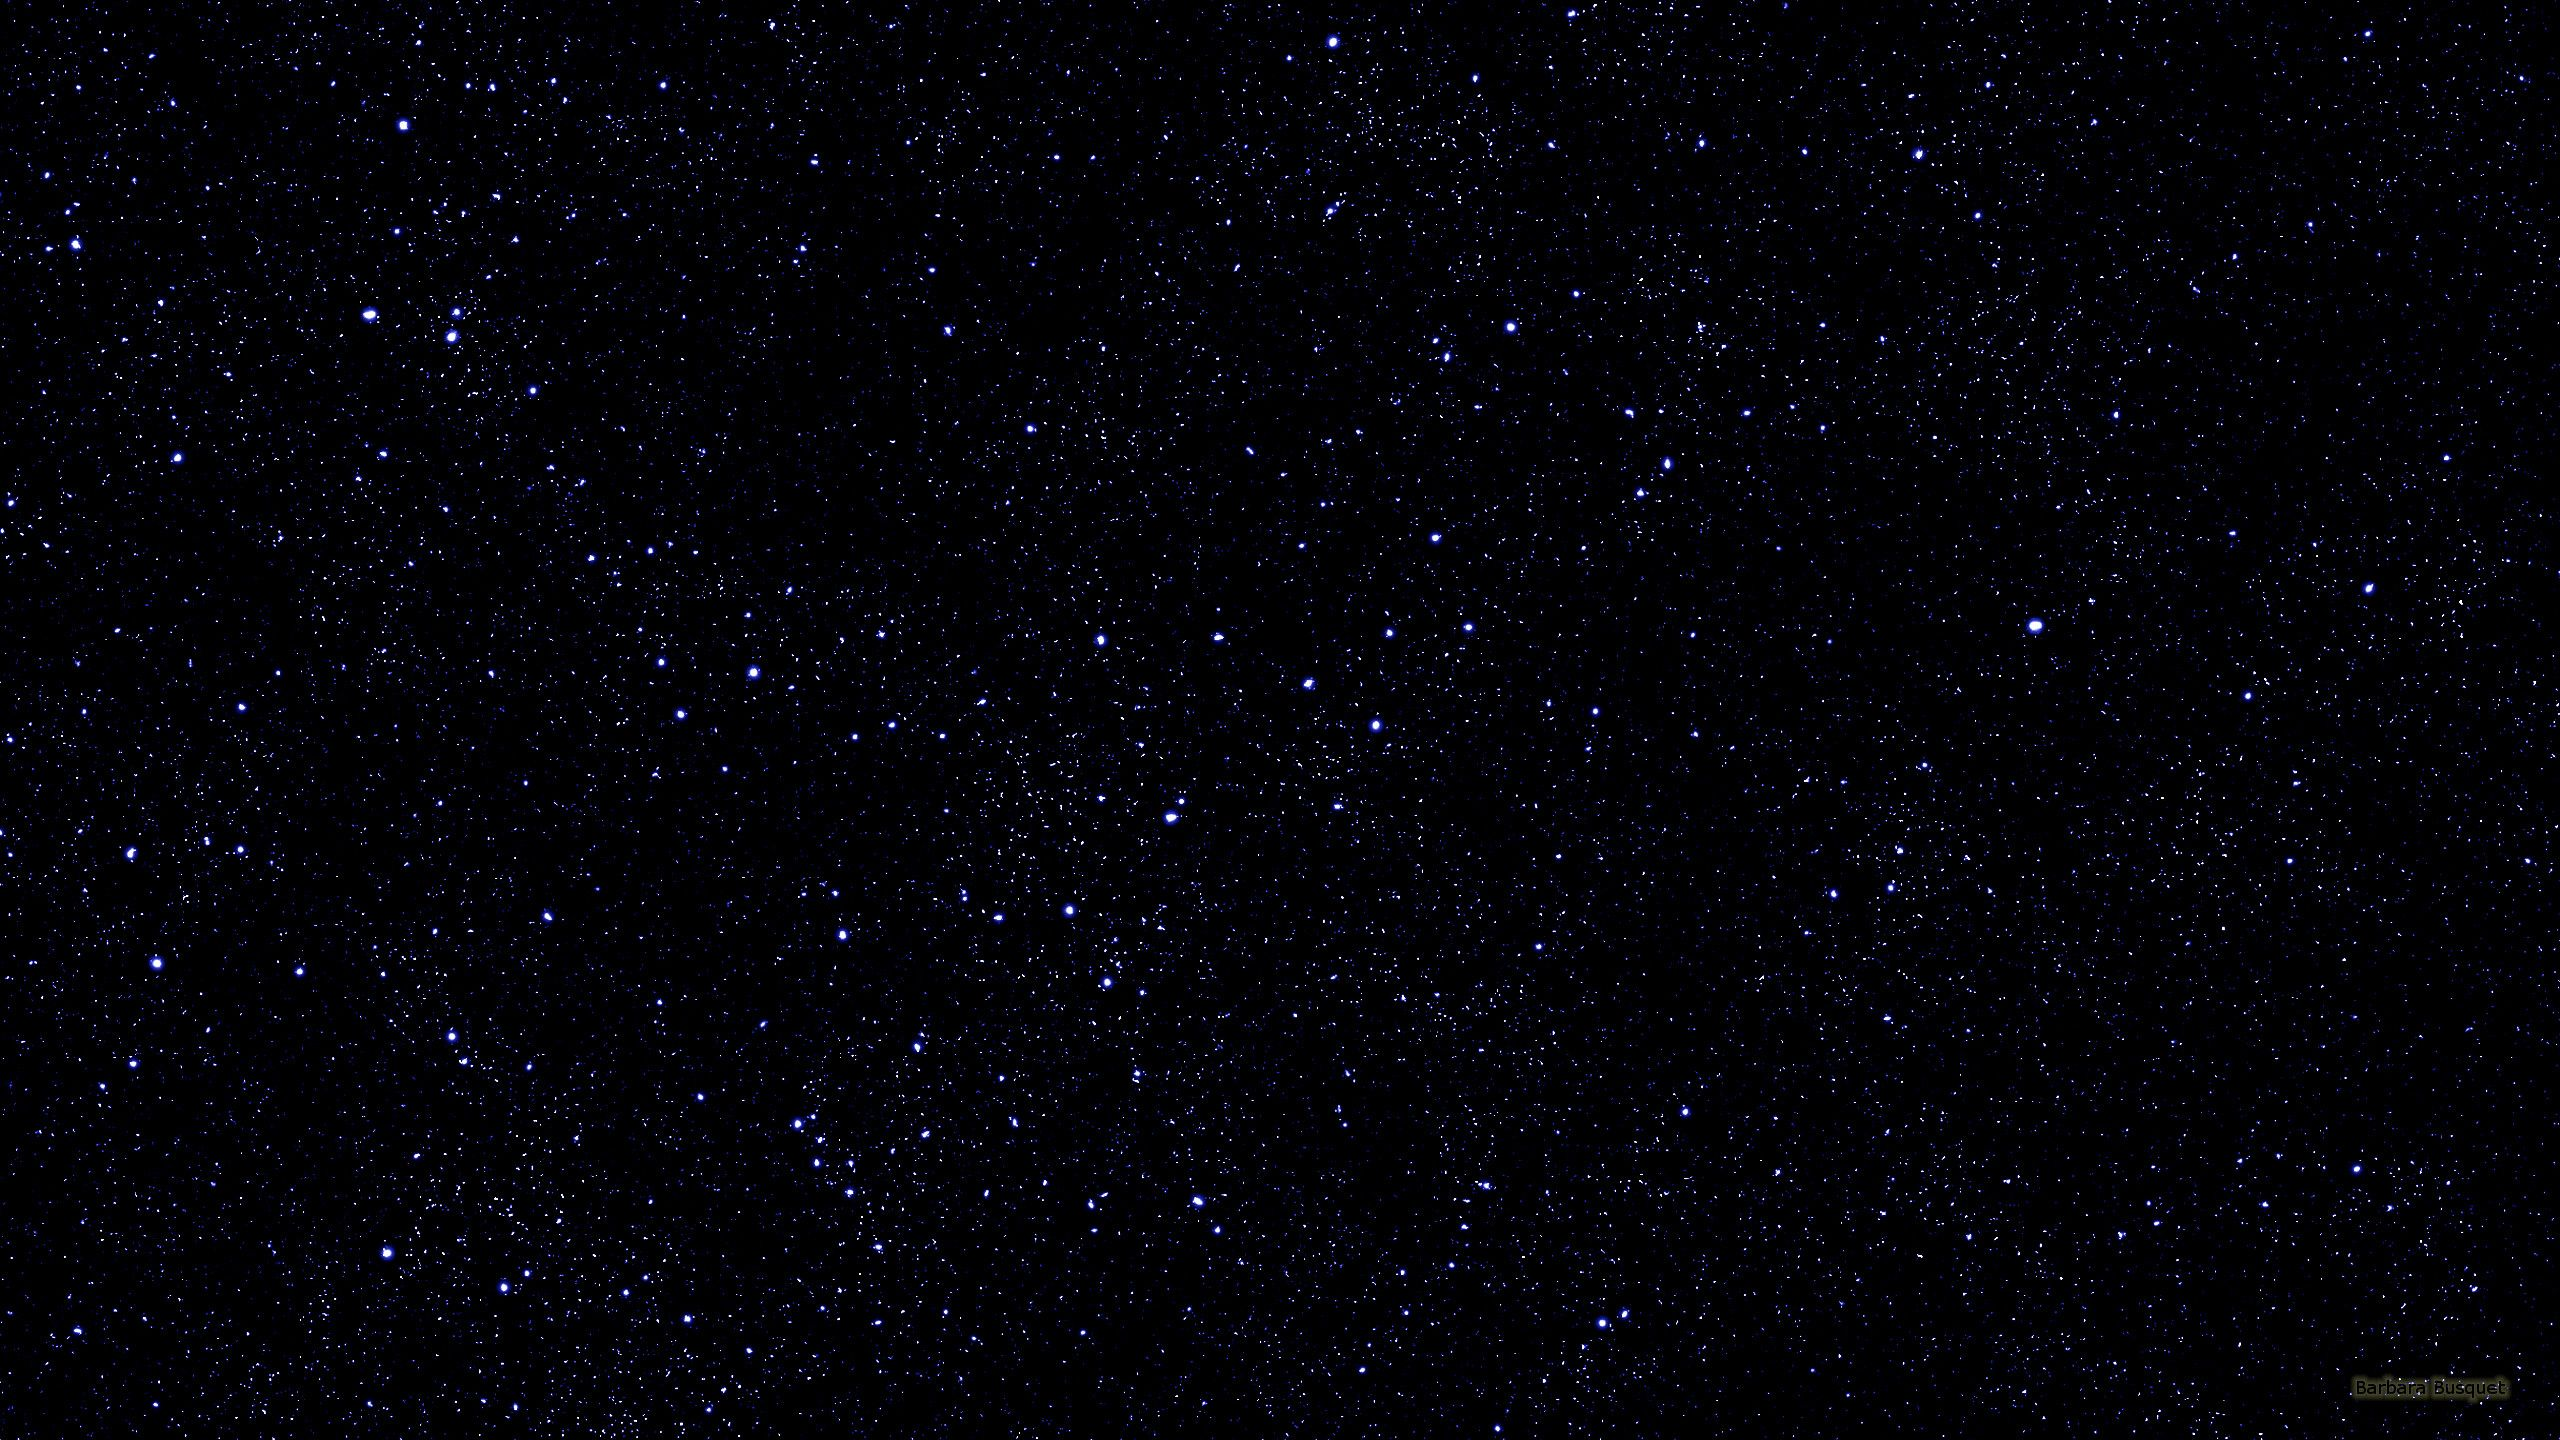 Dark Galaxy Wallpapers Top Free Dark Galaxy Backgrounds Wallpaperaccess